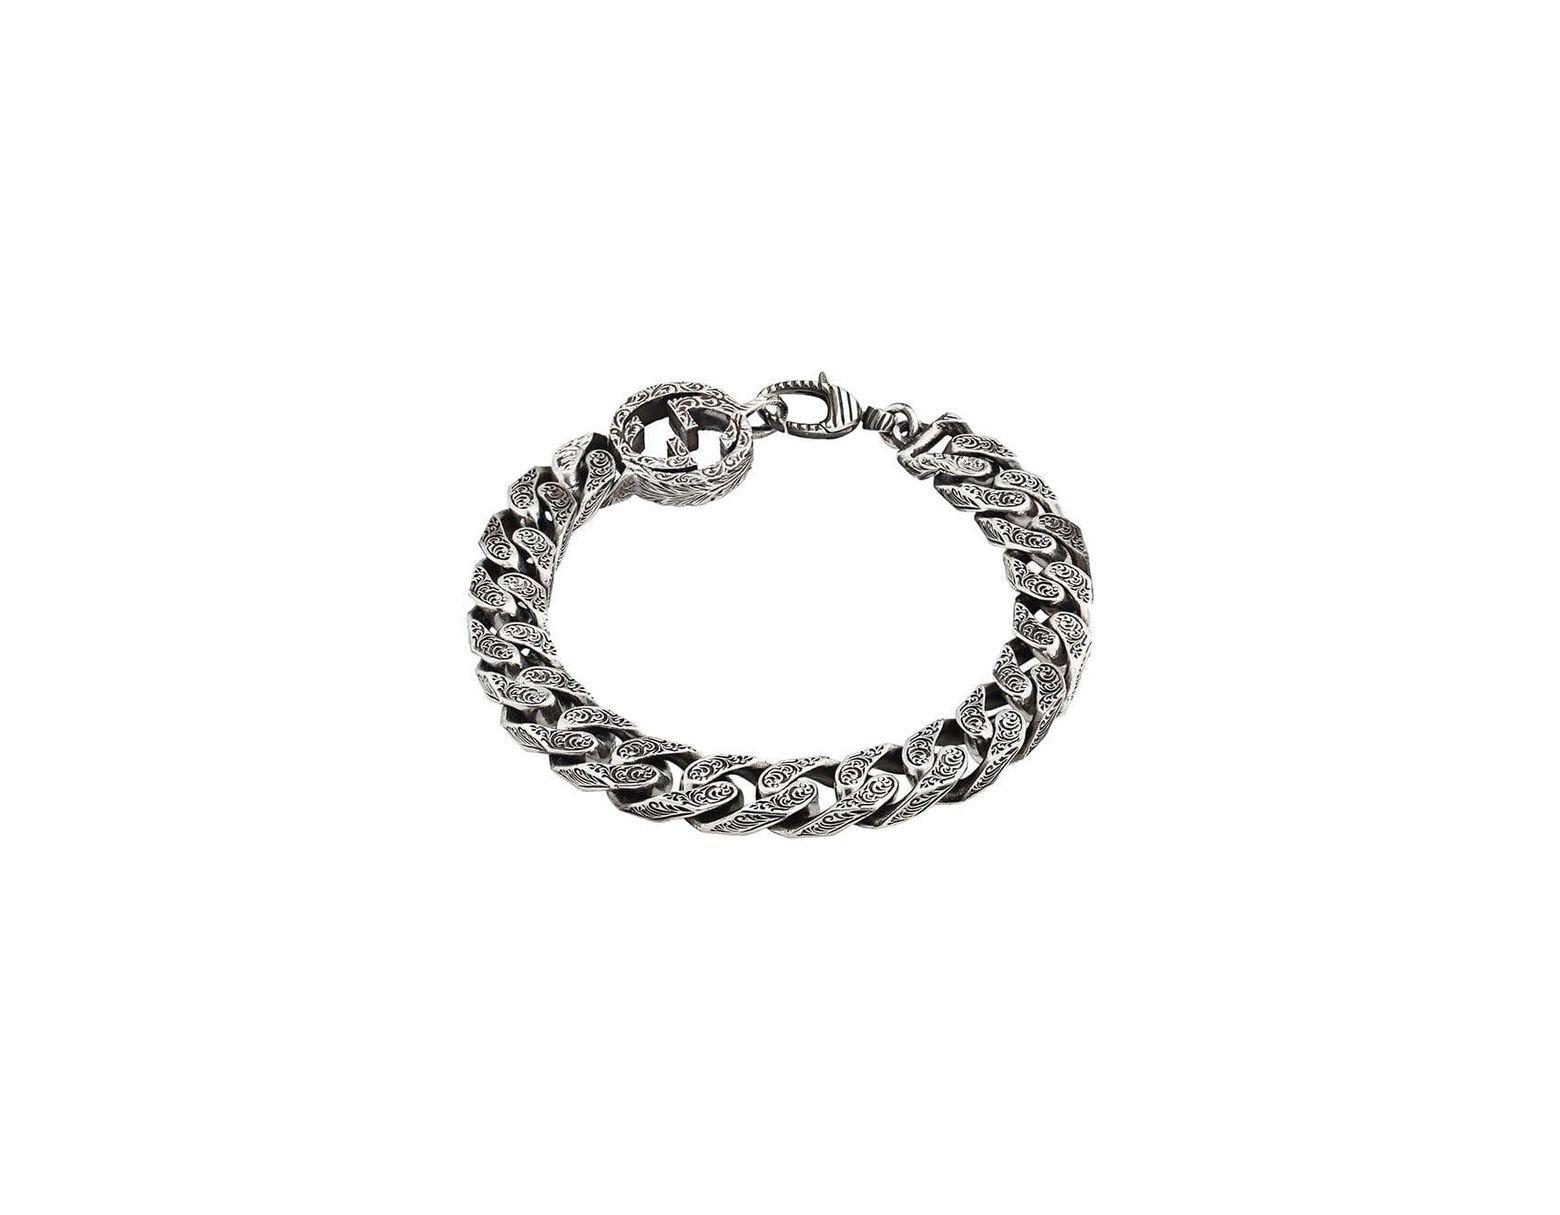 86a951a02 Gucci Interlocking G Chain Bracelet In Silver in Metallic for Men - Save 5%  - Lyst